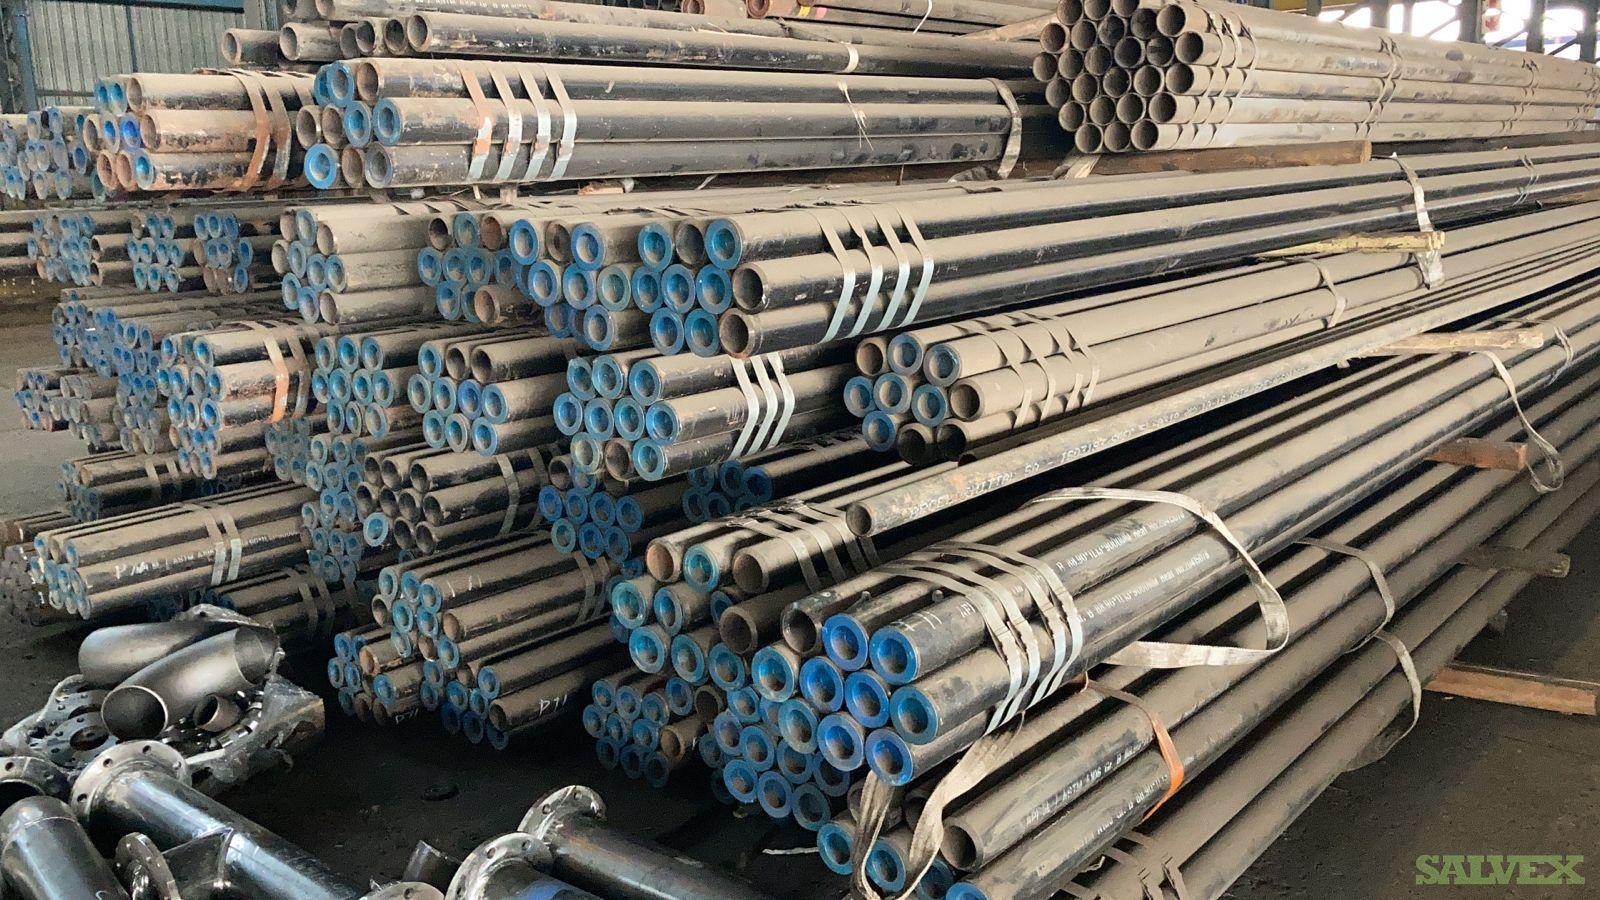 3 1/2 0.437WT Grade B SMLS Surplus Line Pipe (17,718 Feet / 115 Metric Tons)